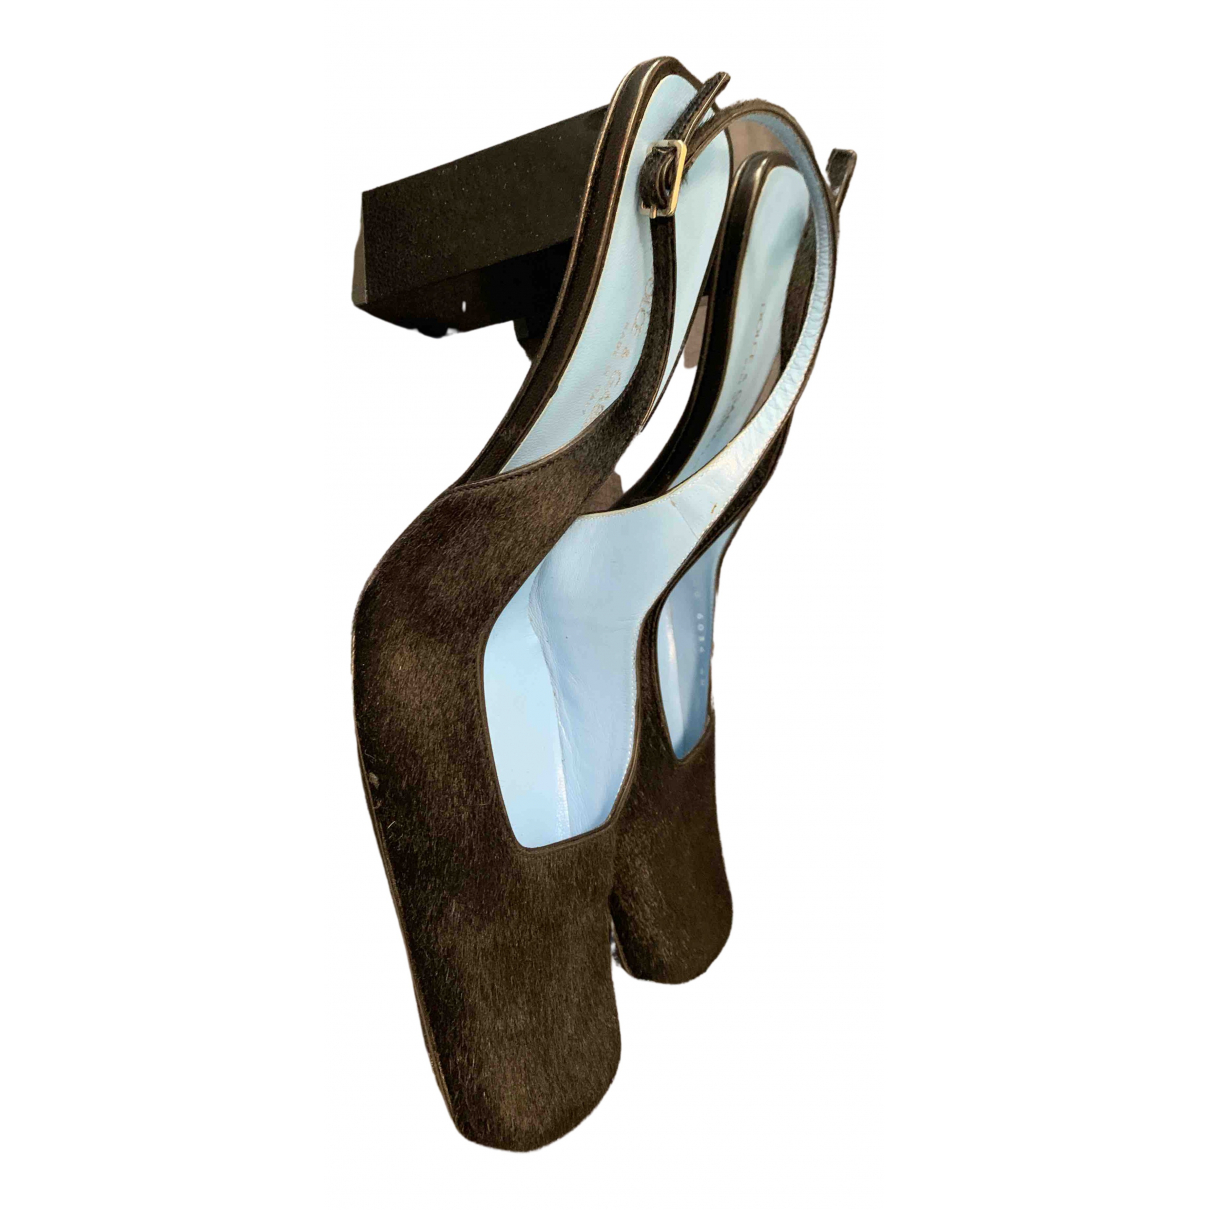 Dolce & Gabbana \N Sandalen in  Schwarz Kalbsleder in Pony-Optik